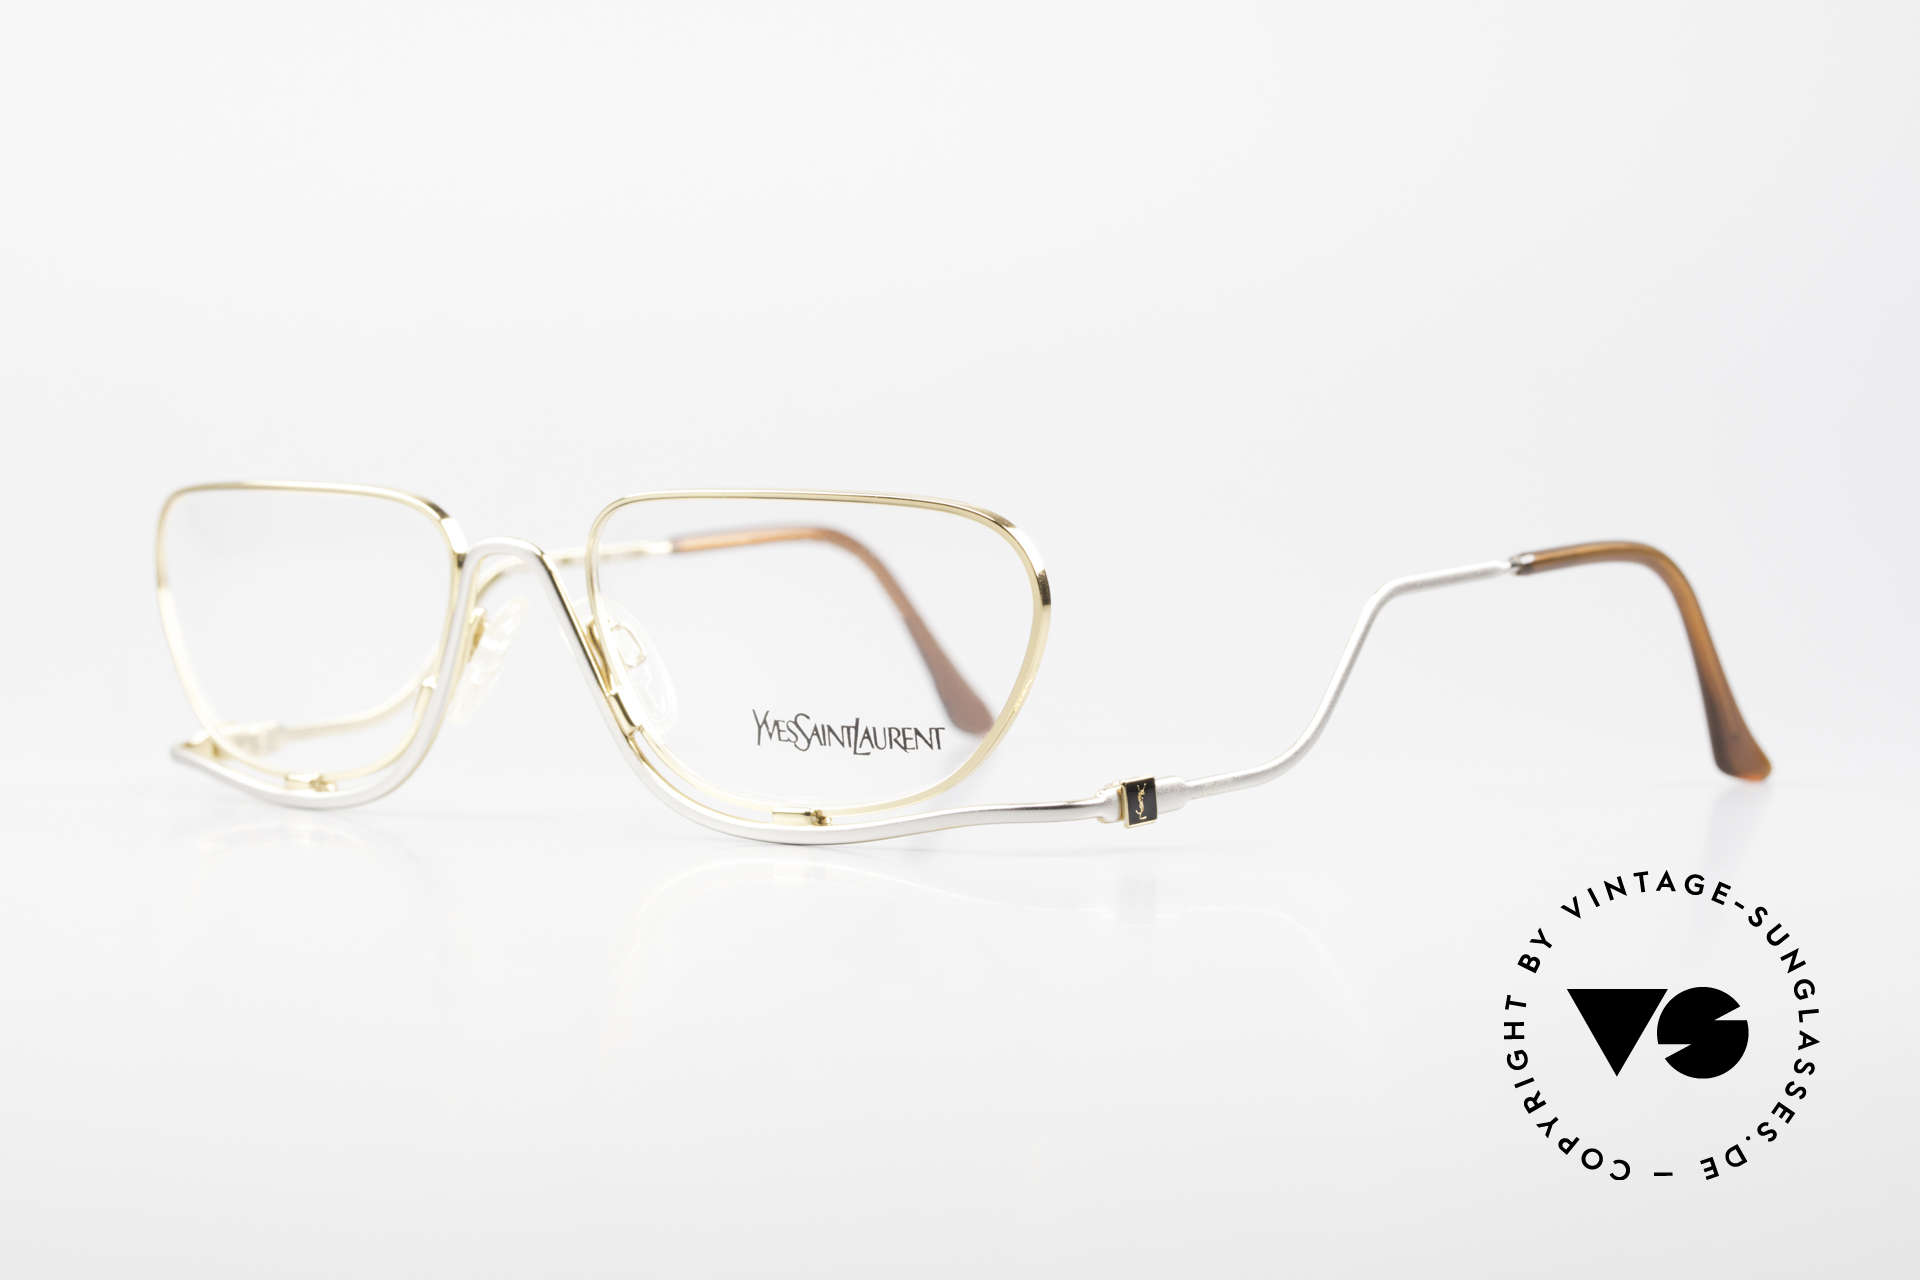 Yves Saint Laurent 4012 Y116 Extraordinary Eyeglasses, simply a glamorous designer frame; eye-catcher, Made for Women